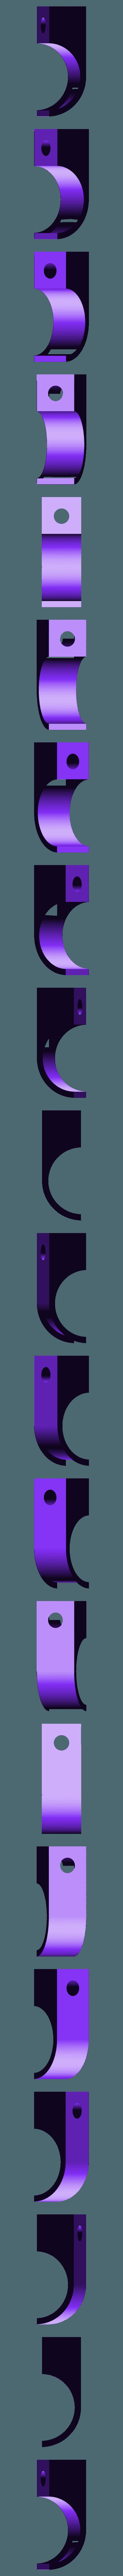 filament_spindle_bracket1.stl Download free STL file FDM Printer de Kleine Reus 300x300x900 • 3D printable object, Job